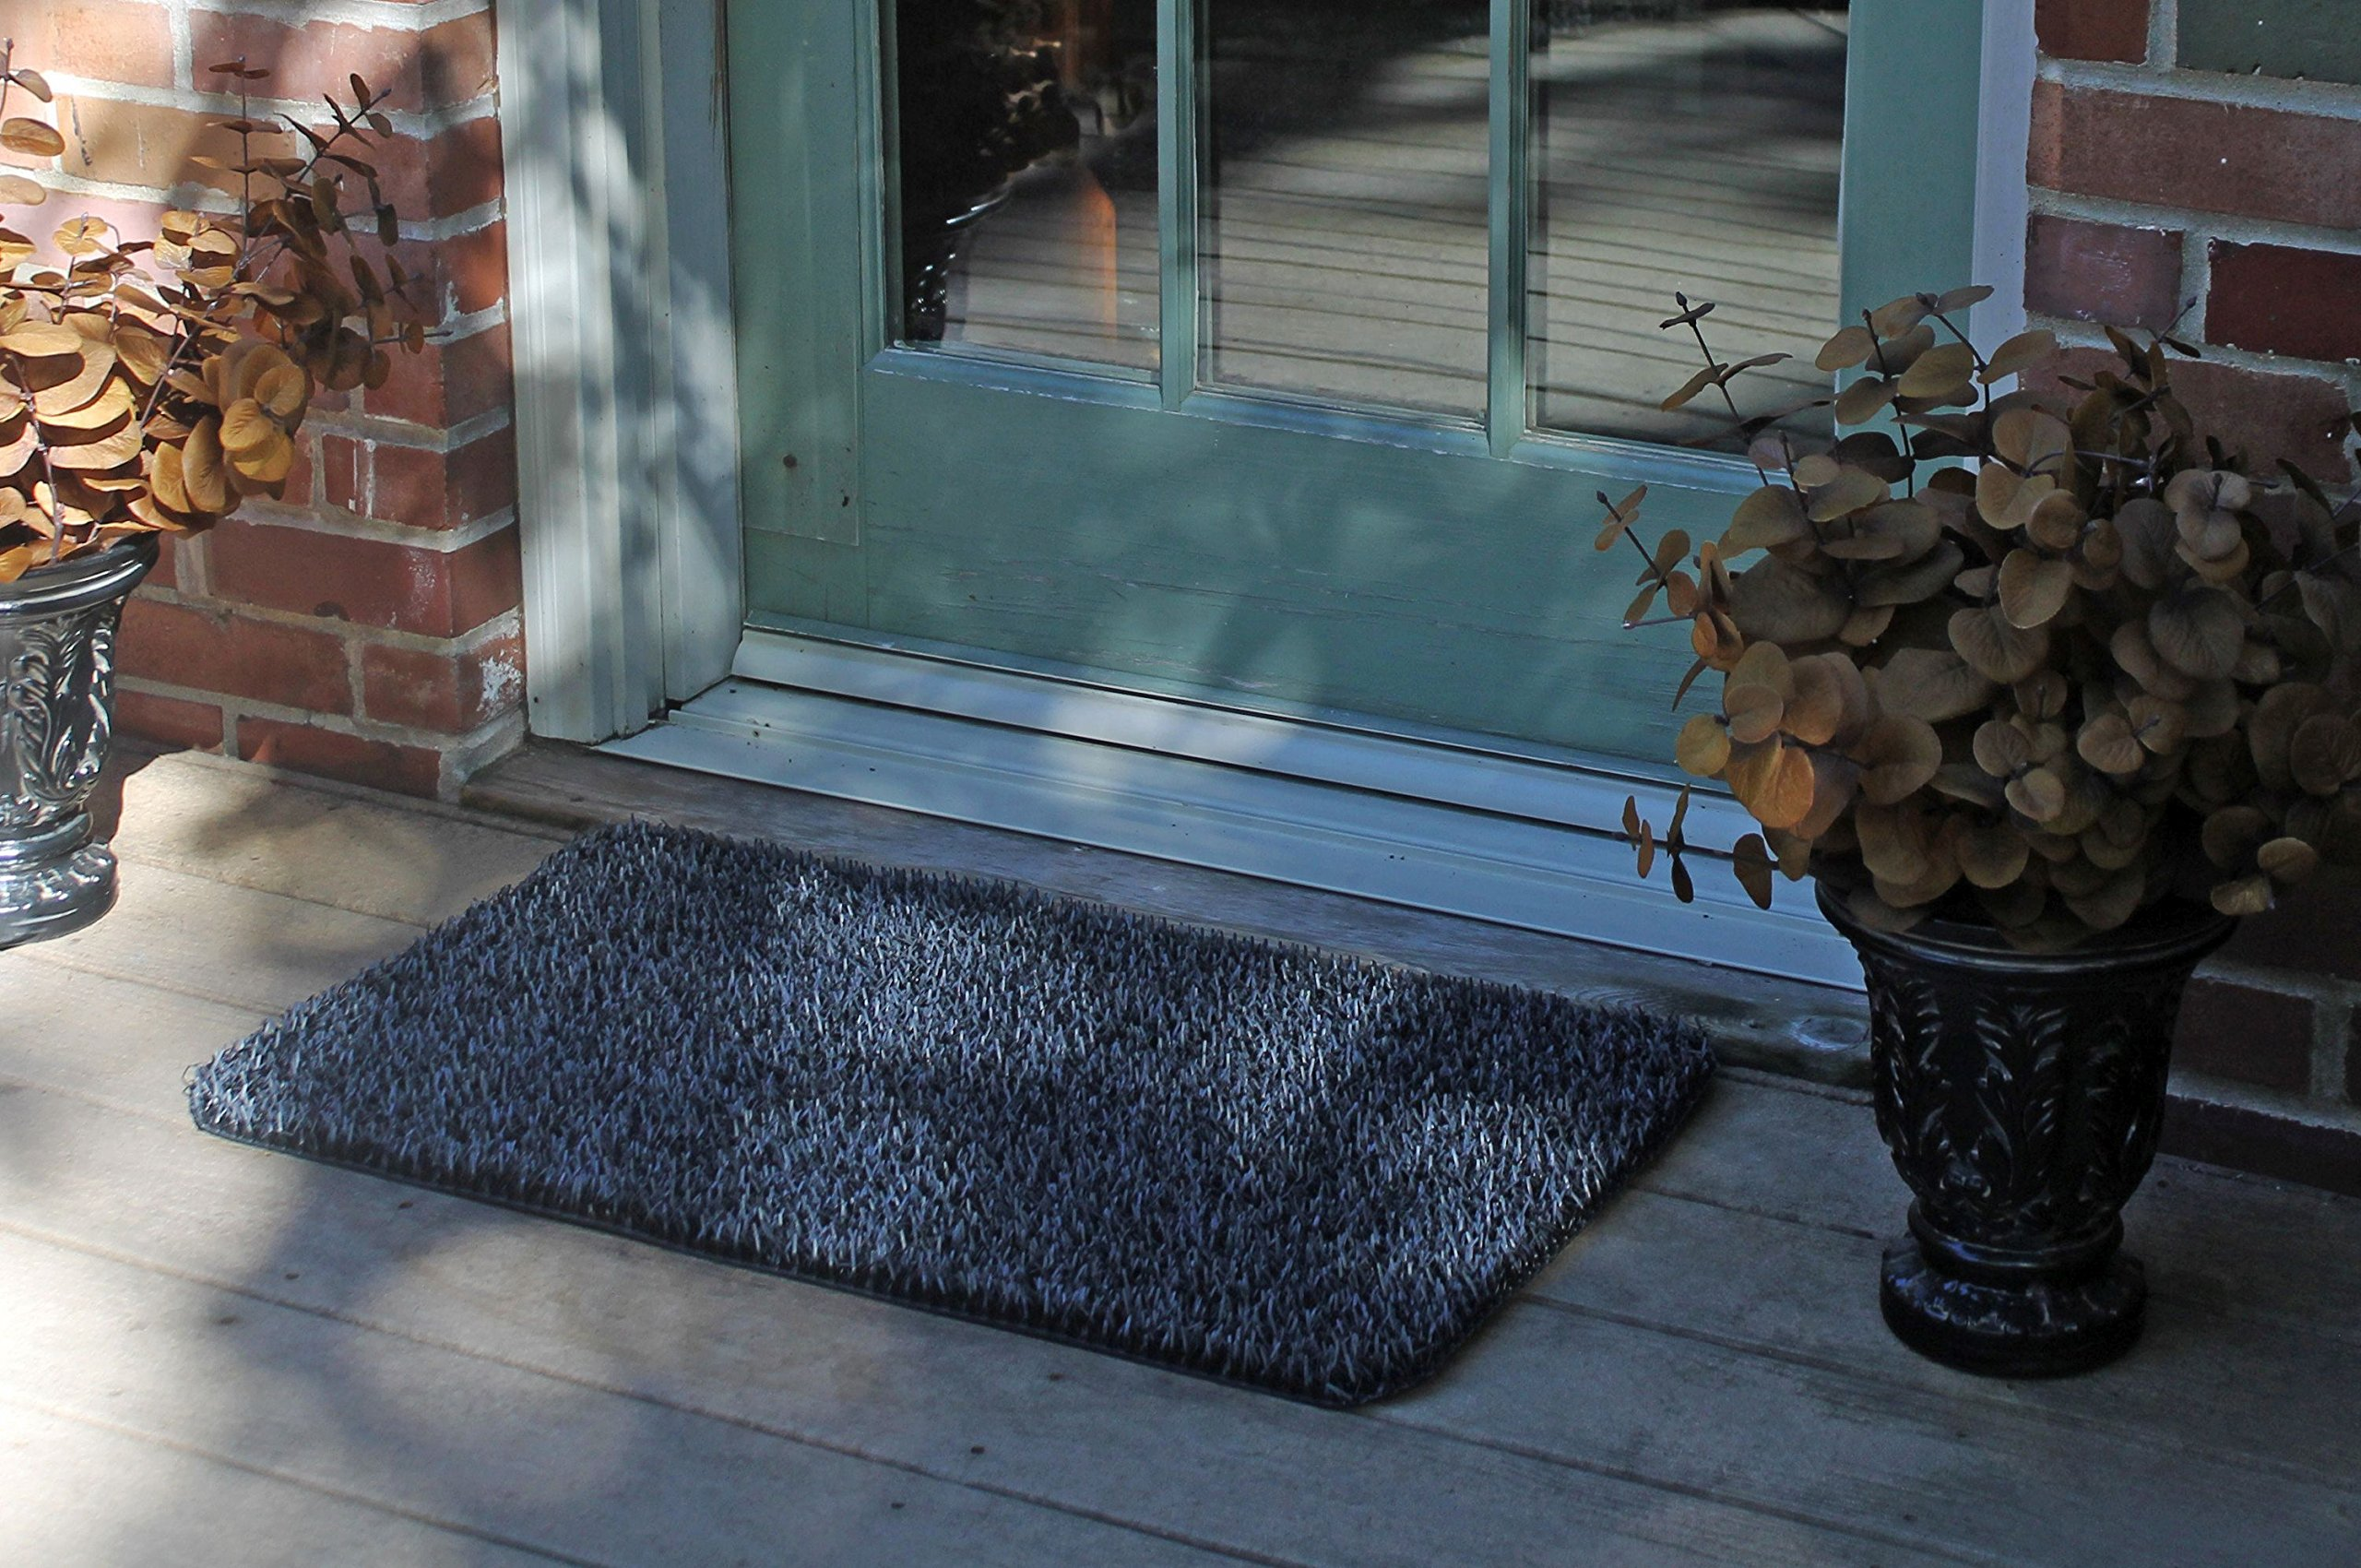 Grassworx Clean Machine High Traffic Doormat, 18'' x 30'', Charcoal (10376337)